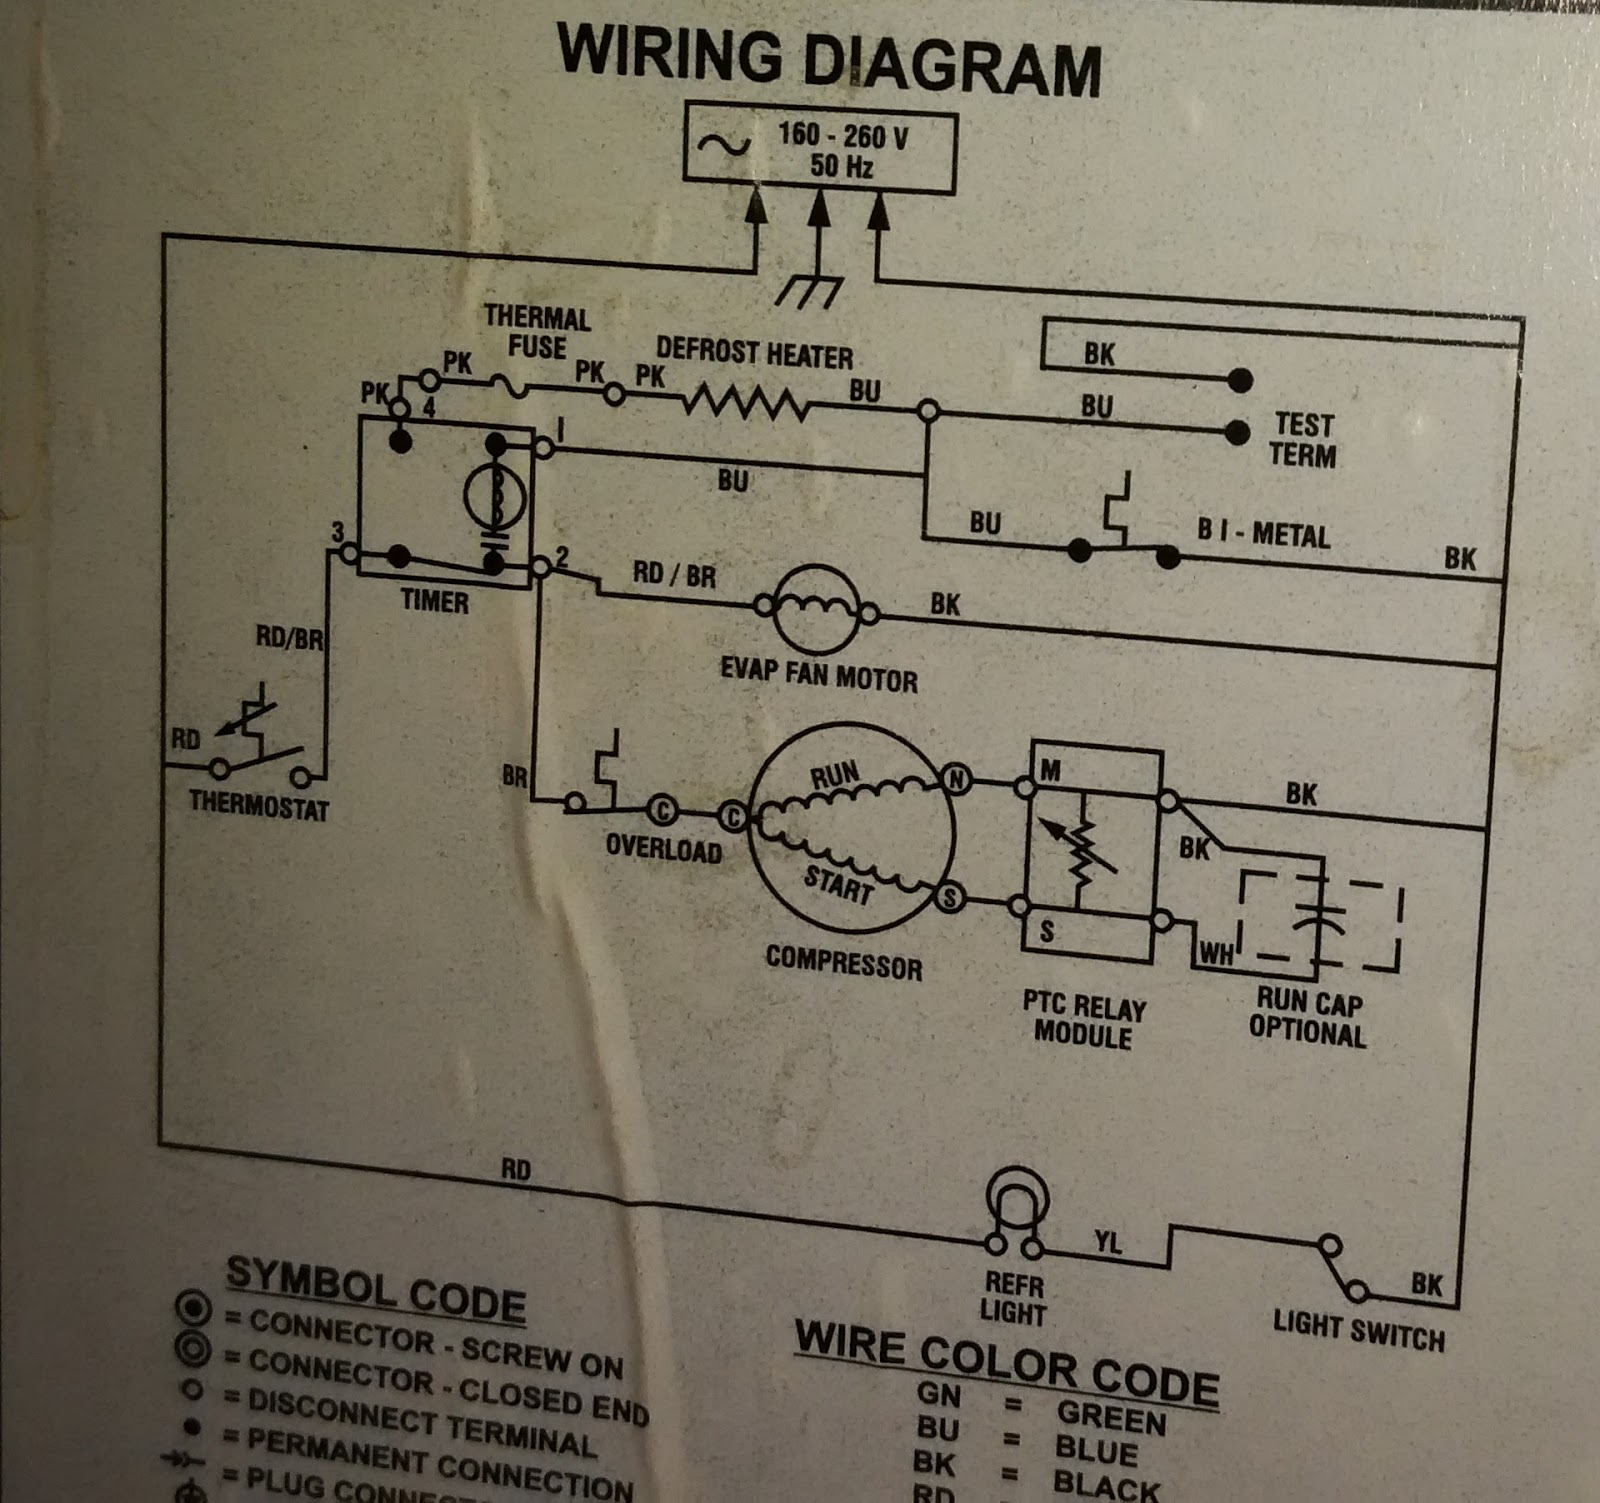 medium resolution of wiring diagram of double door refrigerator